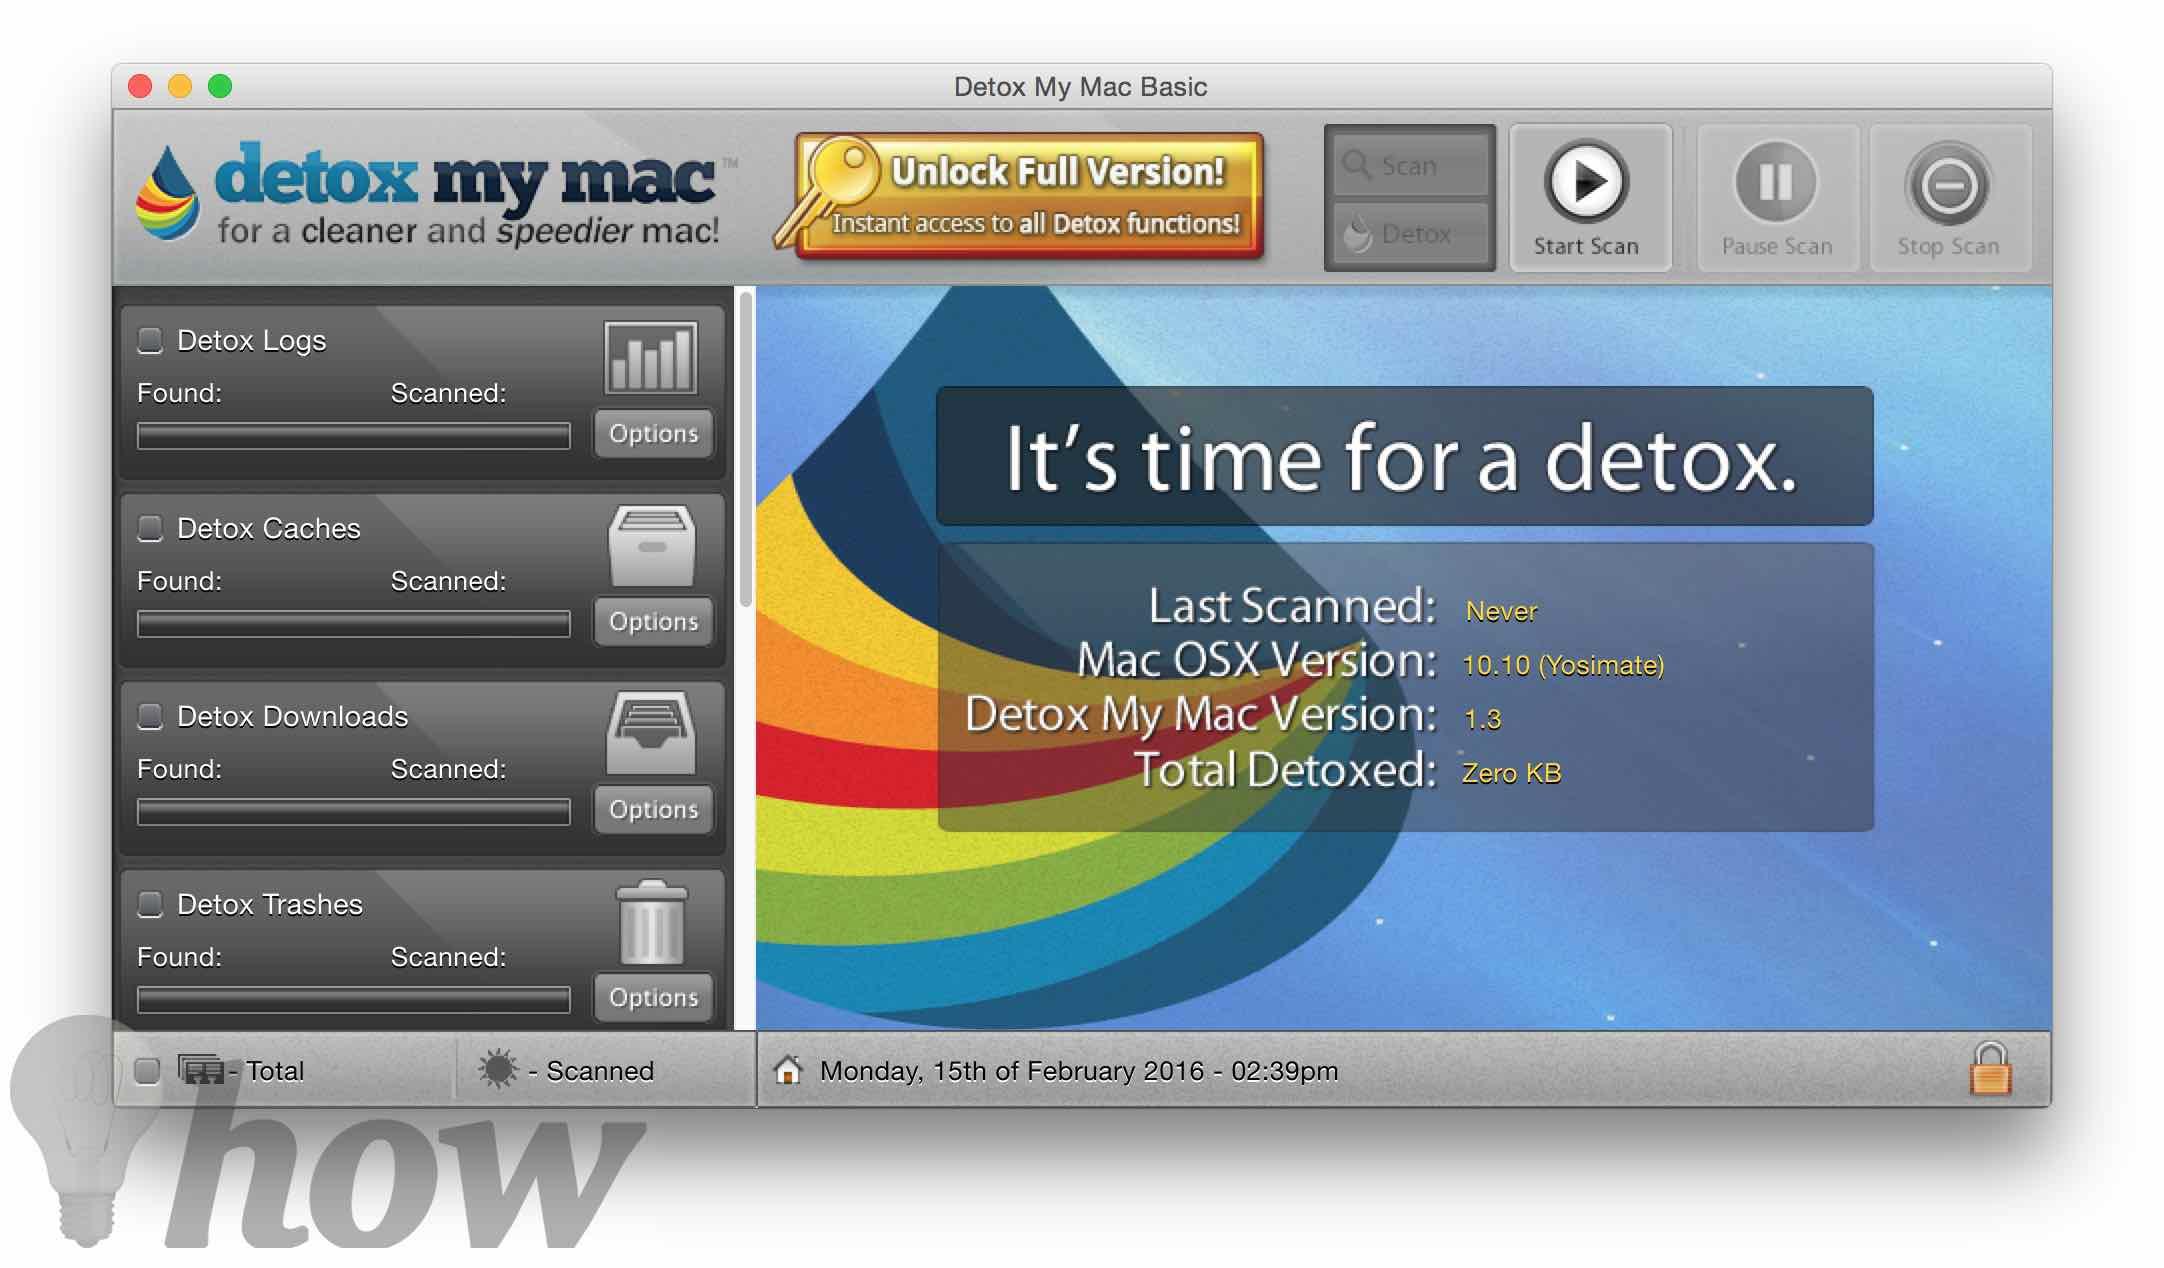 DetoxMyMac